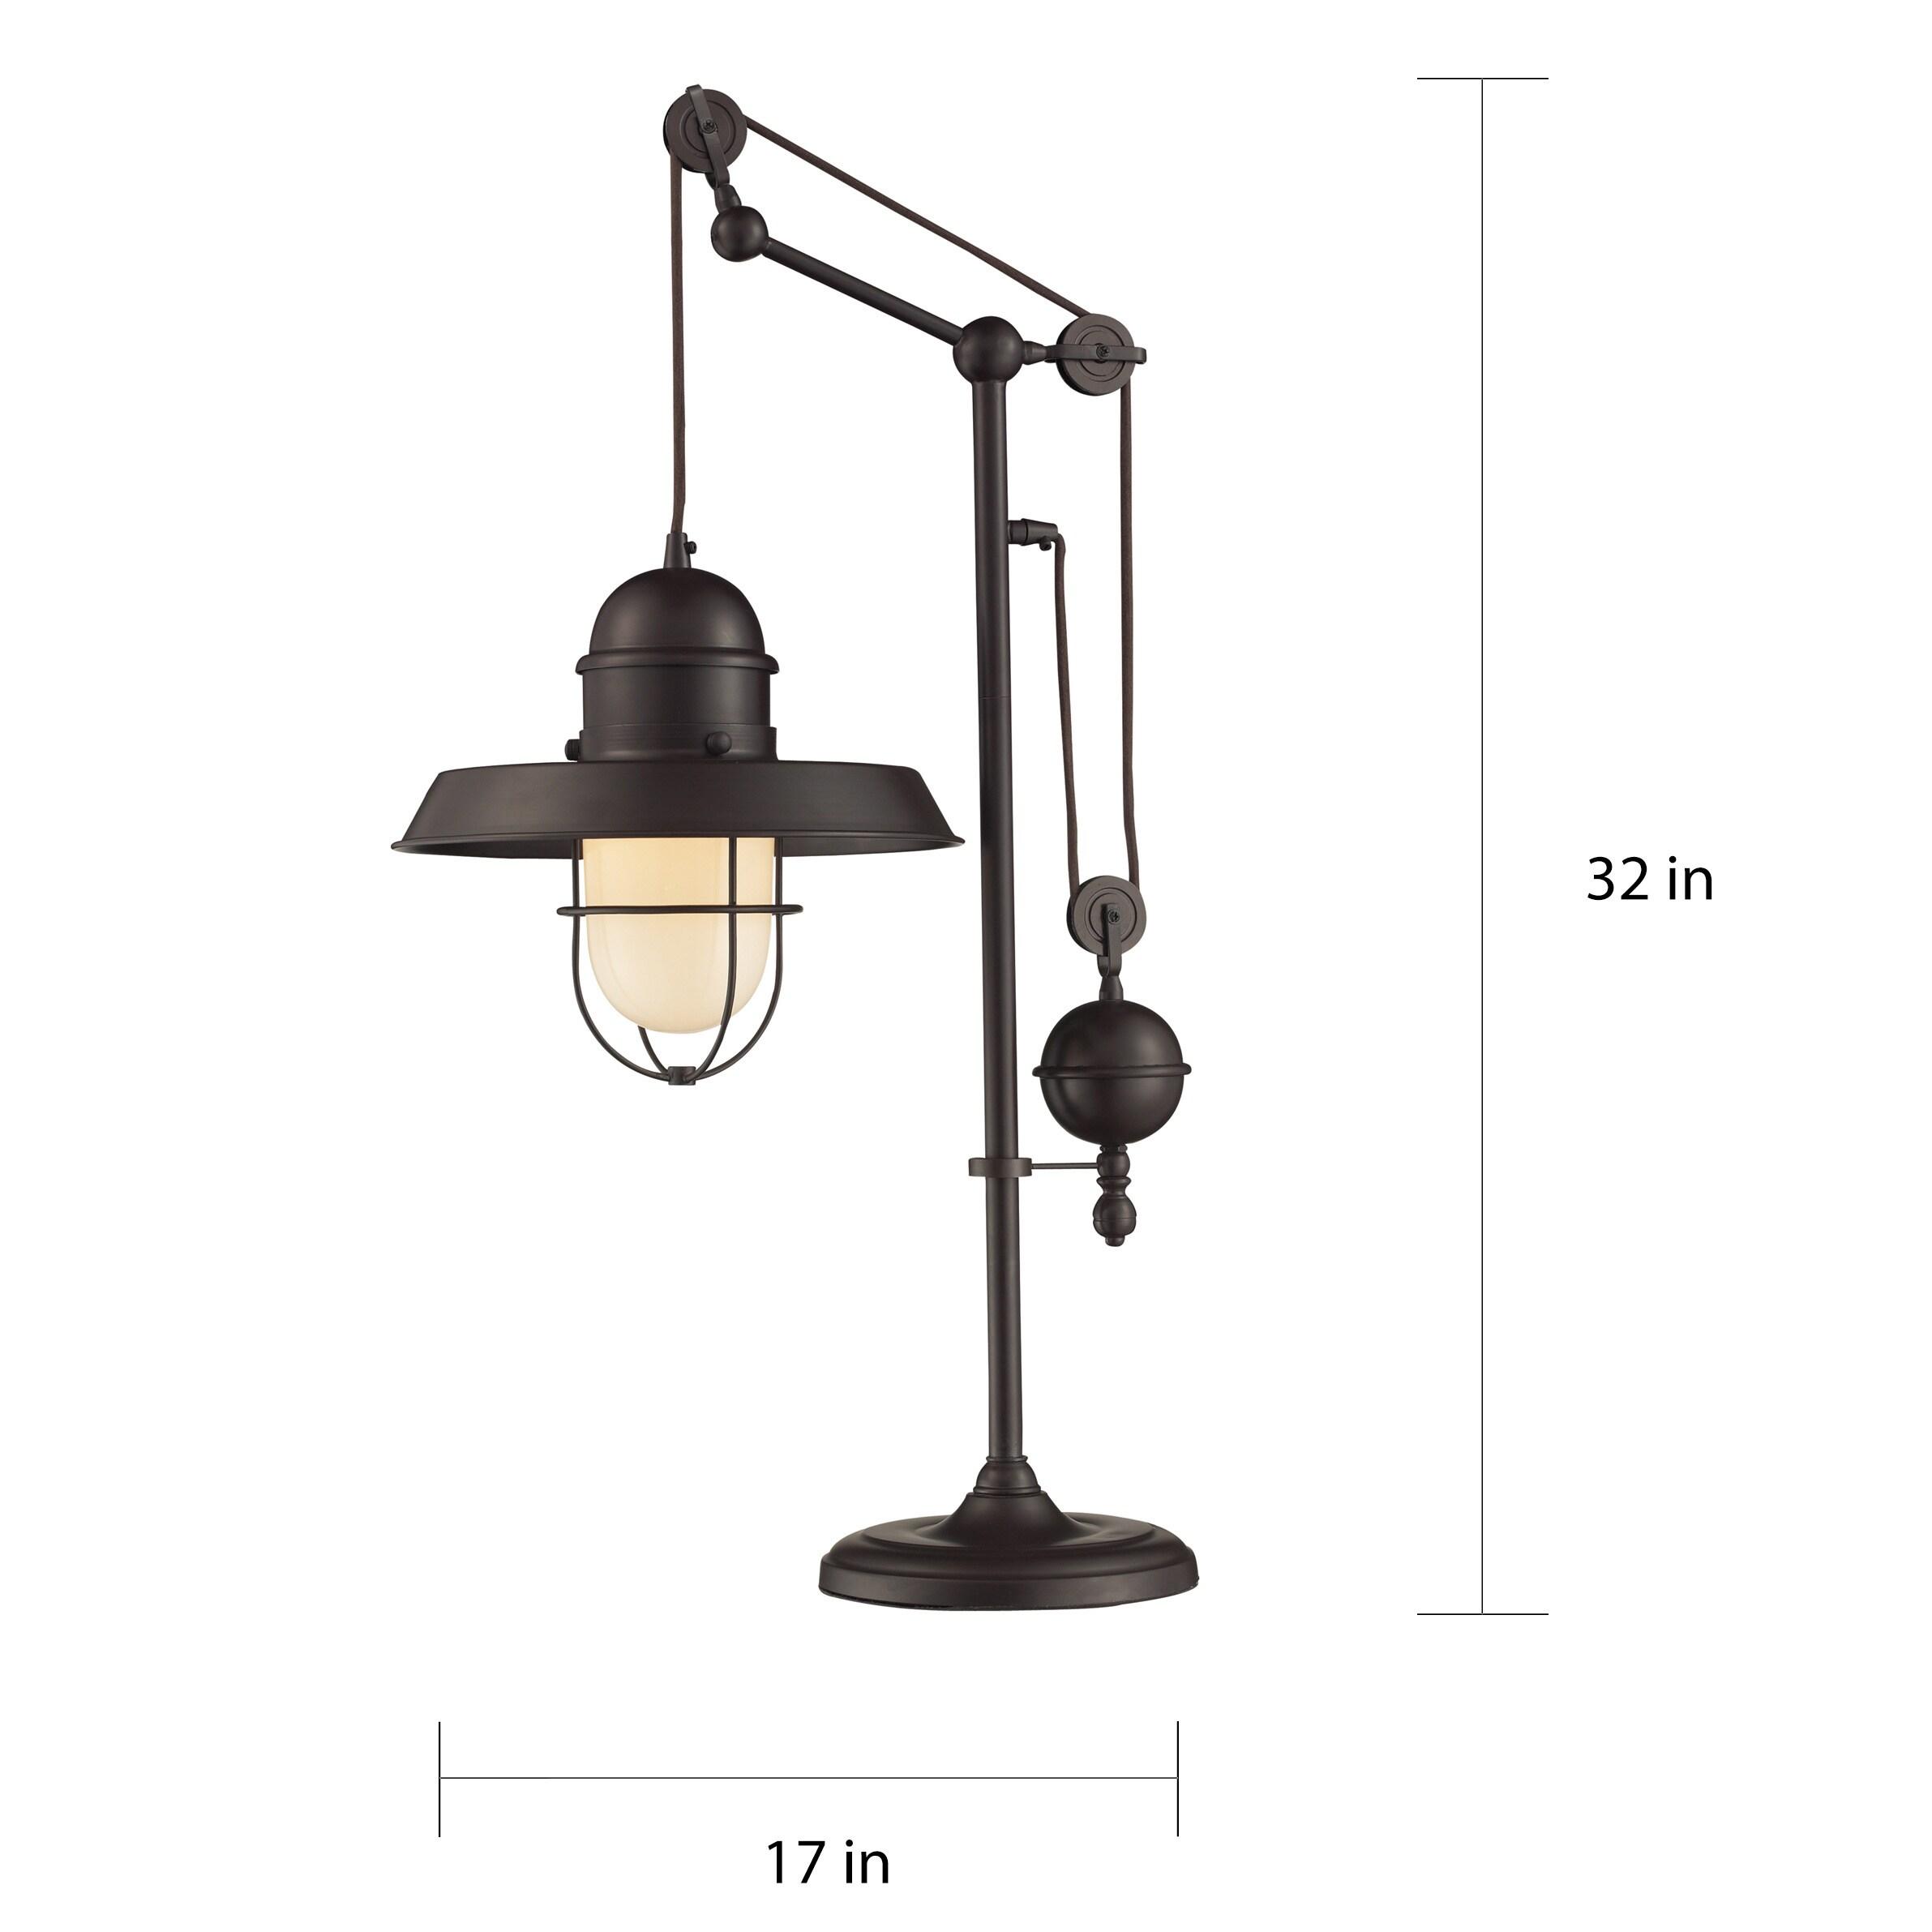 Dimond Lighting Oil Rubbed Bronze Metal 1 Light Table Lamp 17 W X 12 D 32 H